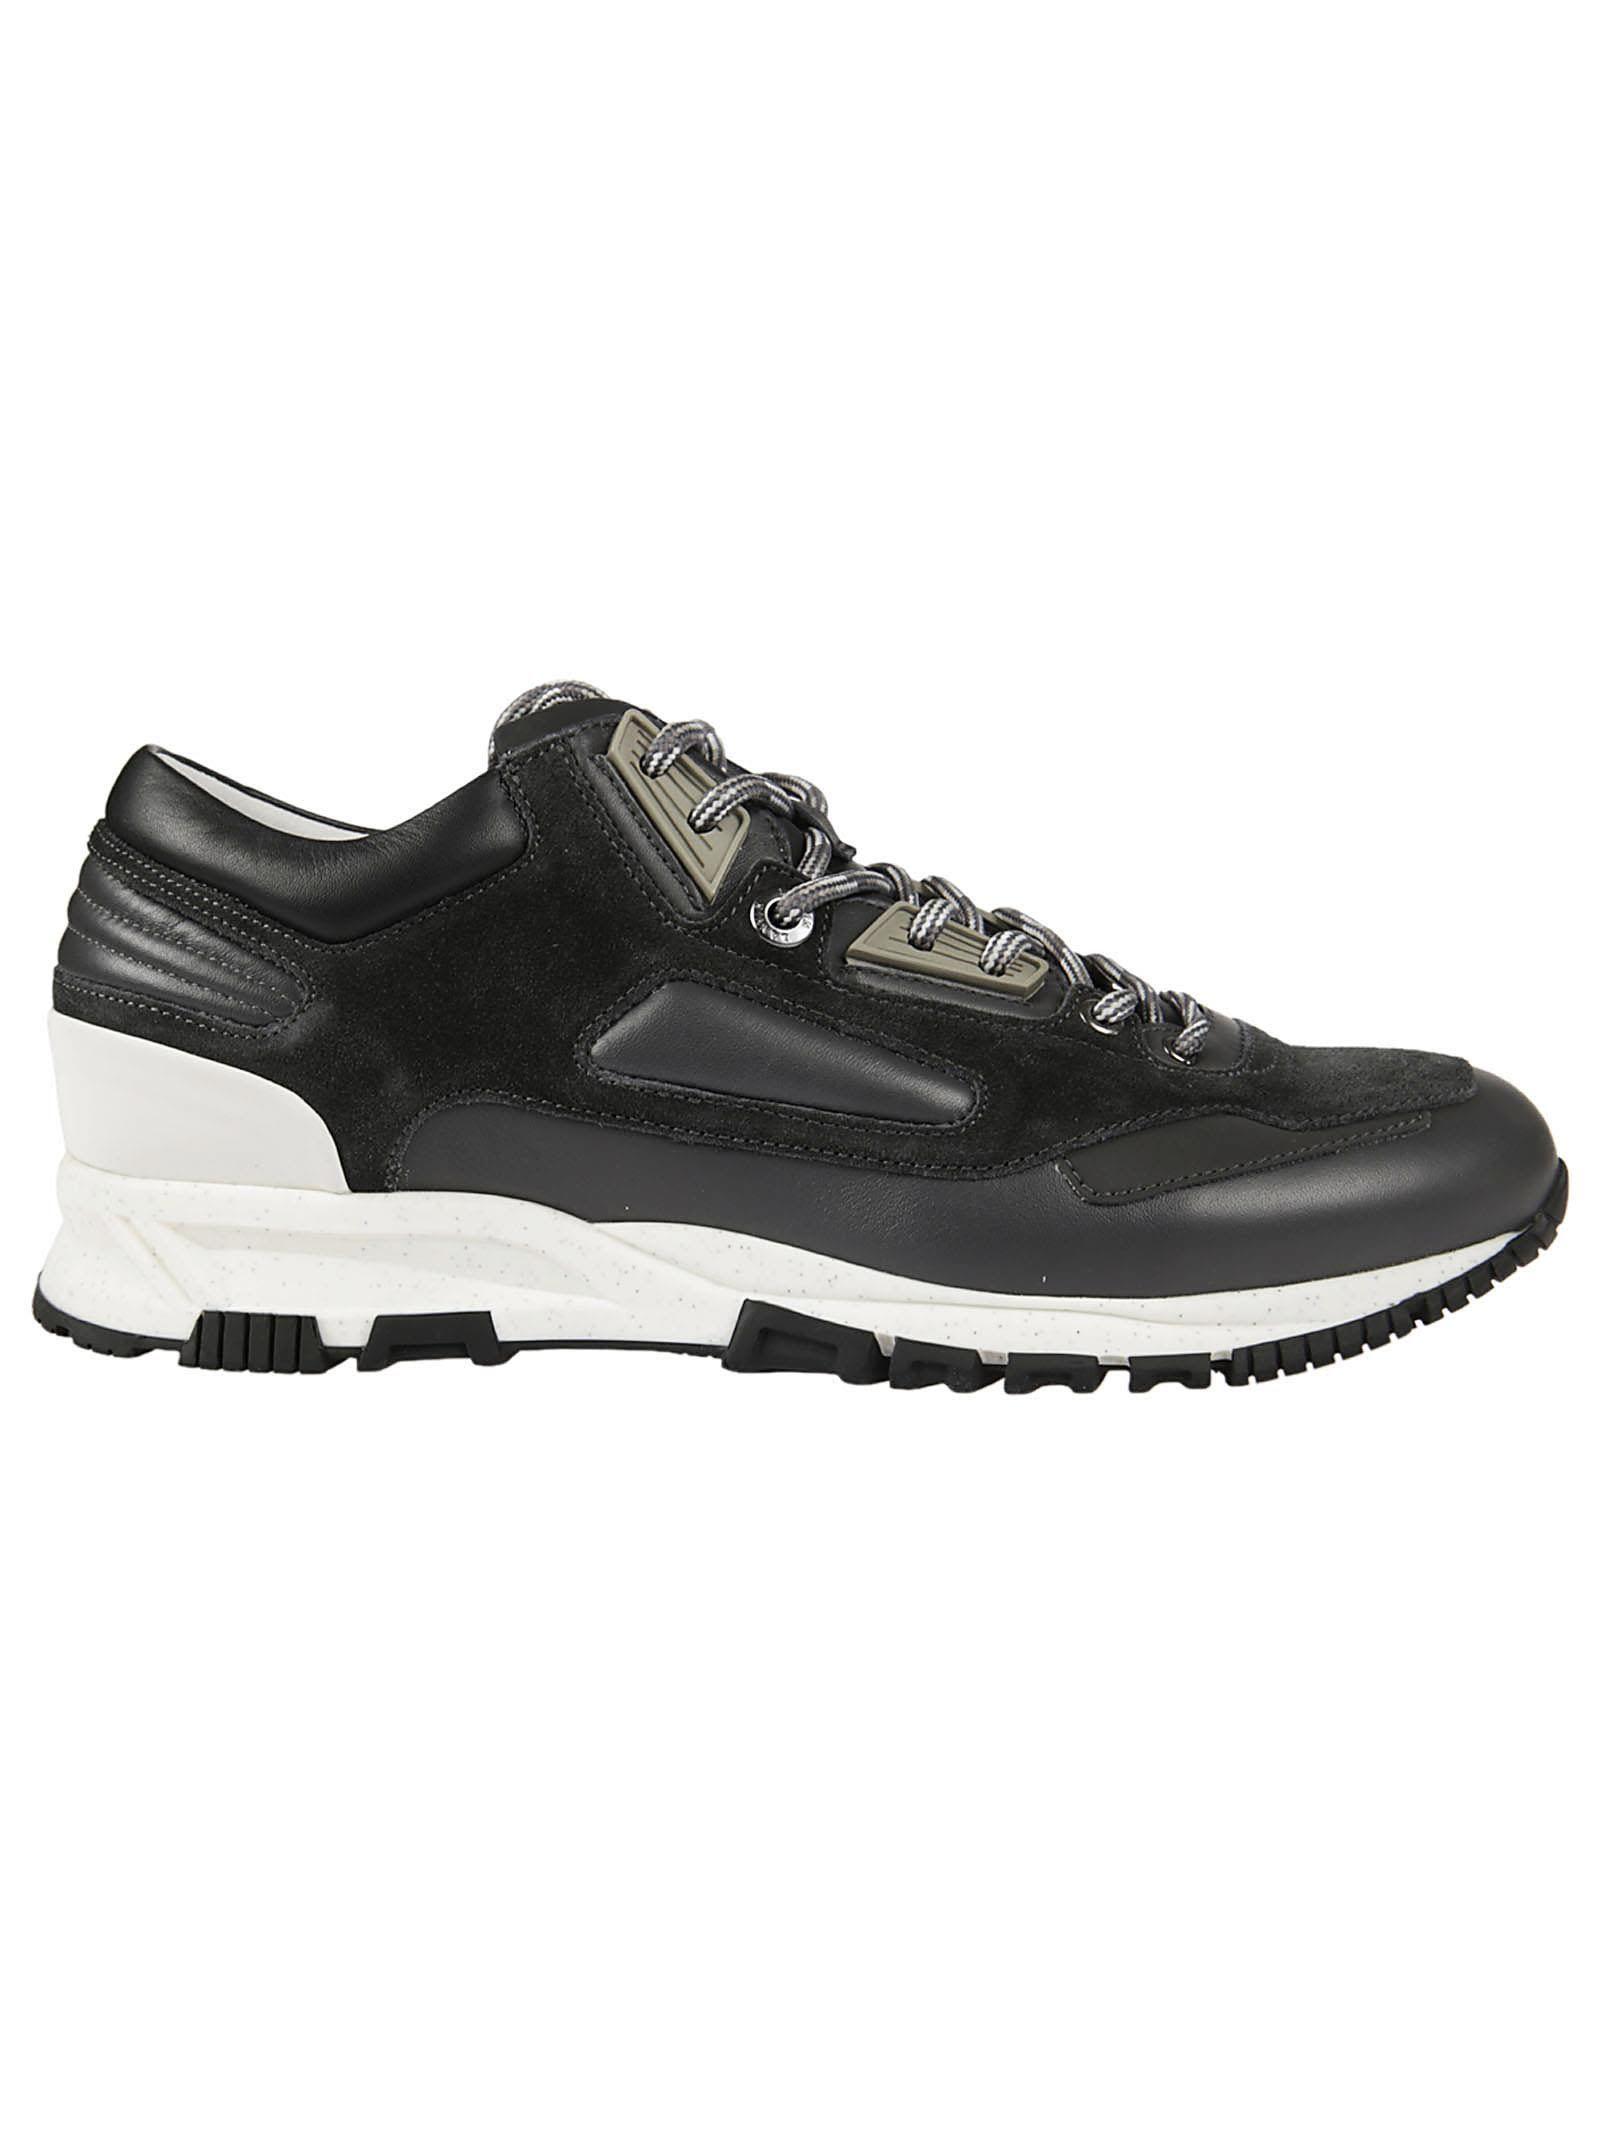 LANVIN RUNNERS SNEAKERS. #lanvin #shoes